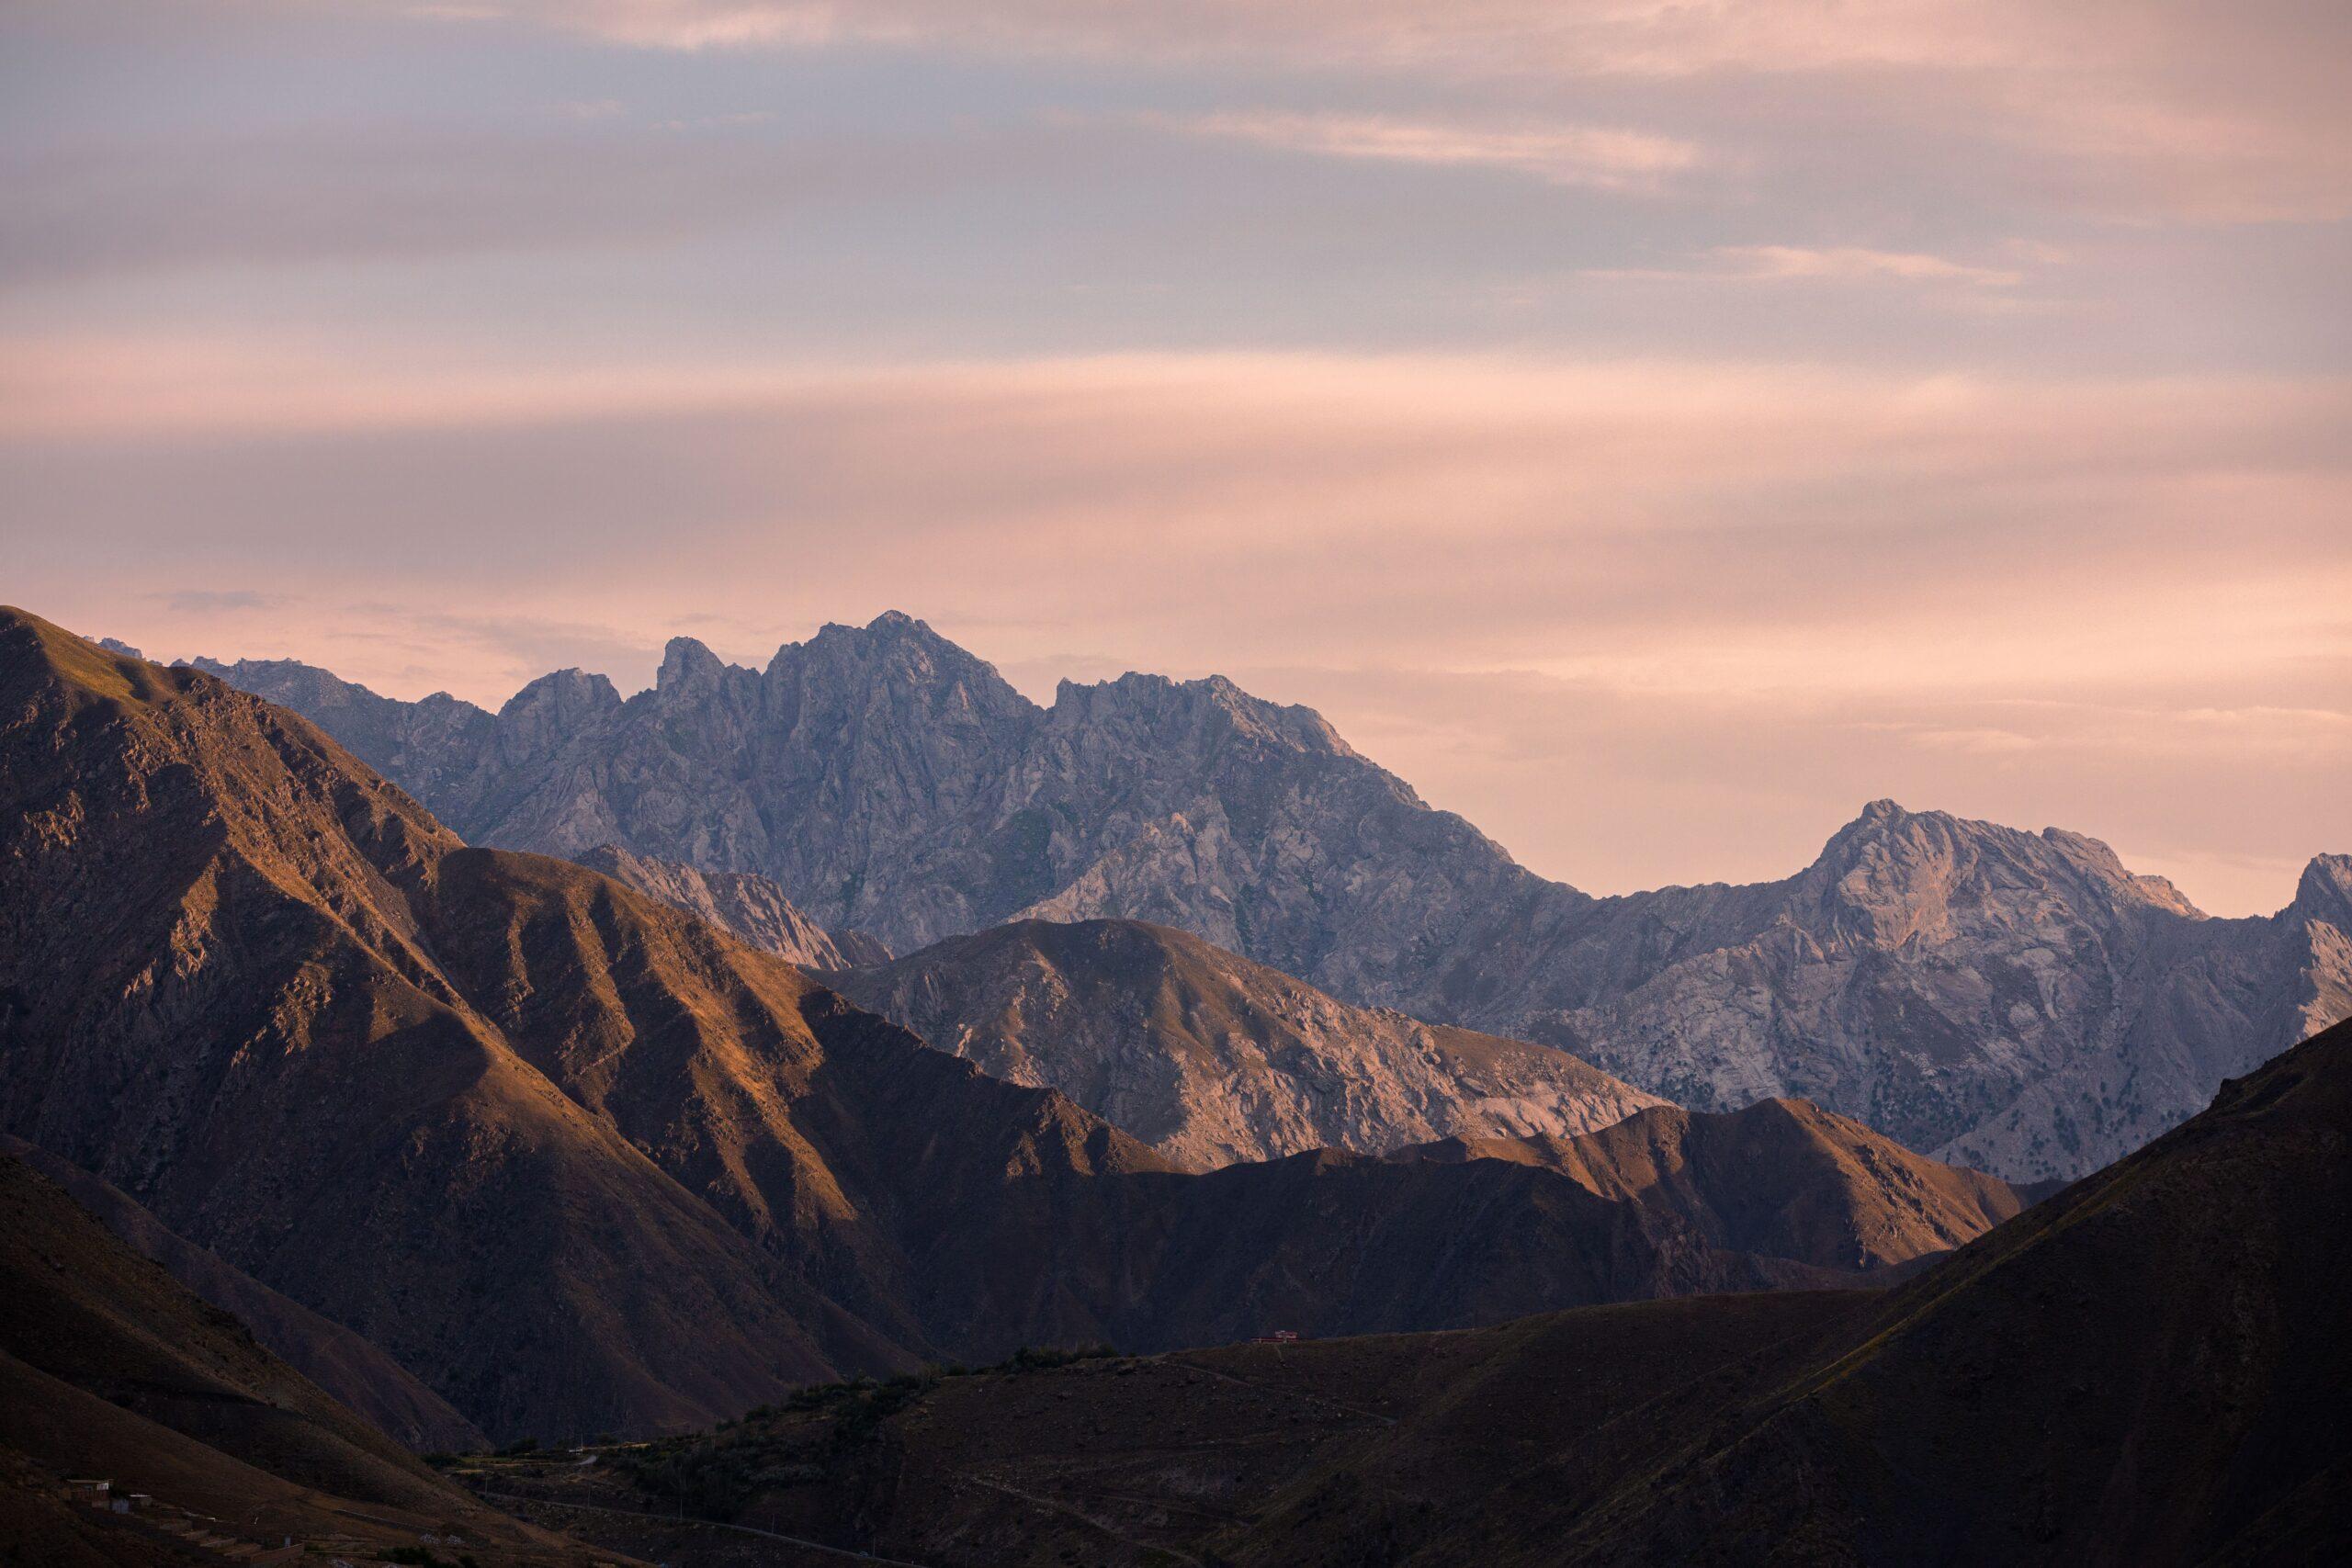 nasim-dadfar-mountains-of-afghanistan.jpg